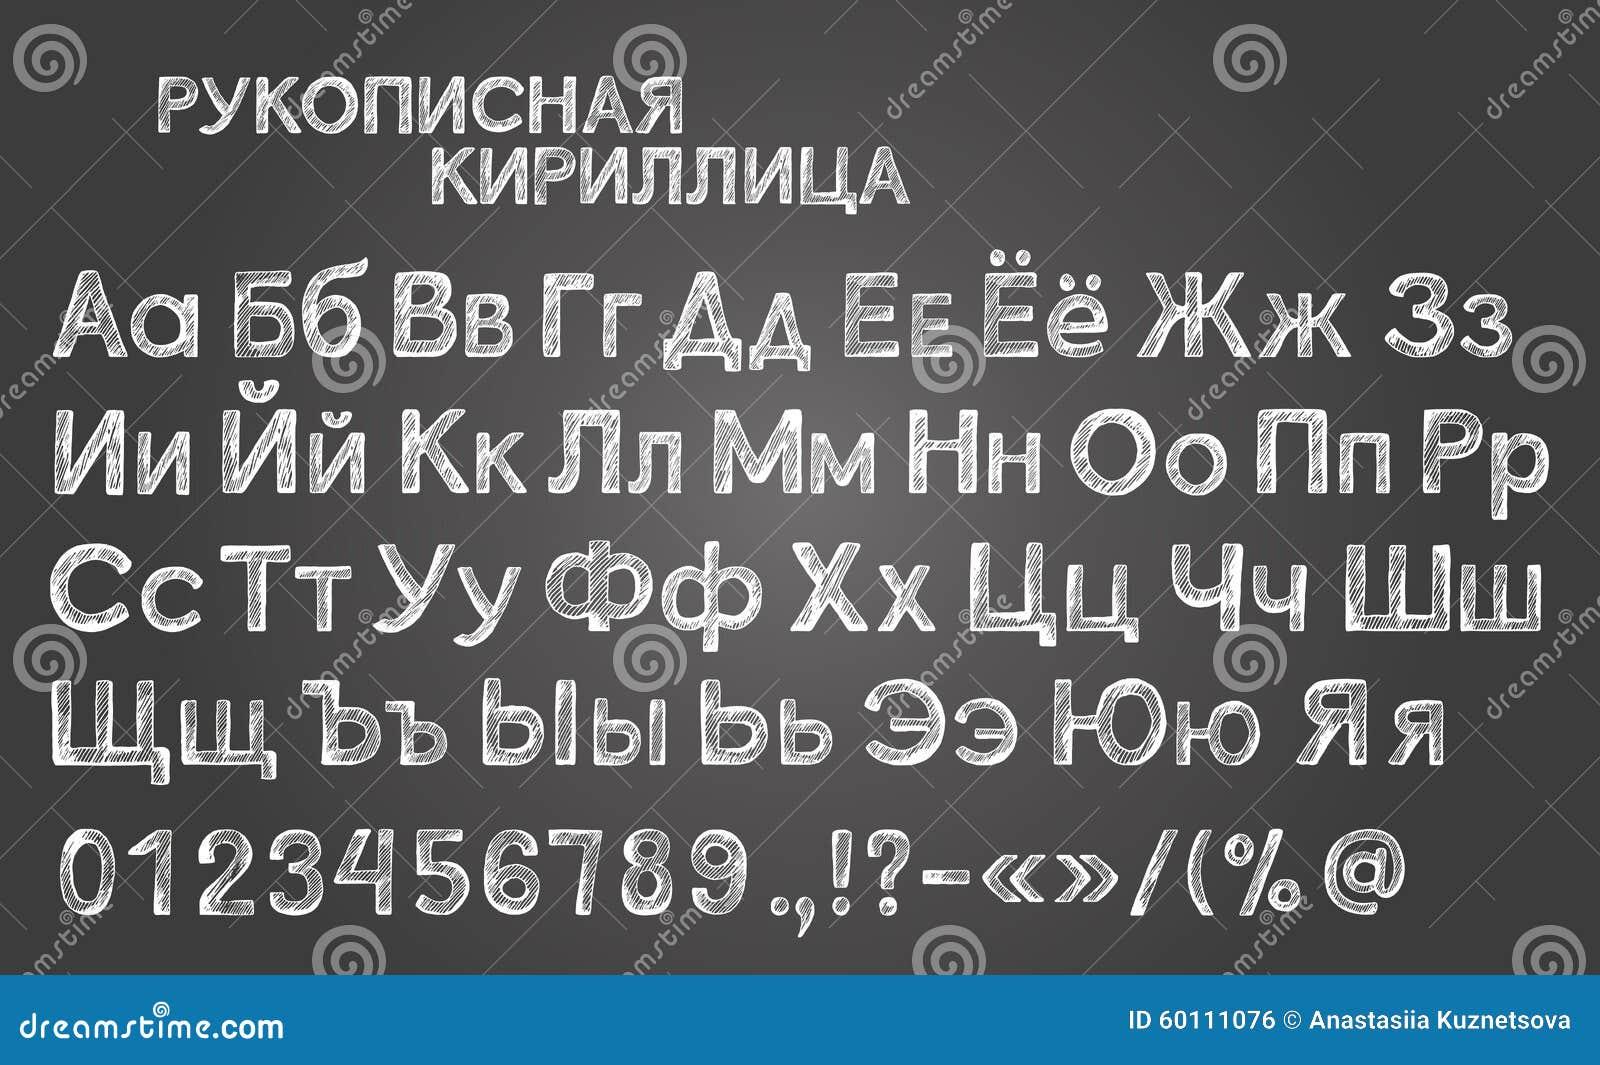 Hand Drawn Cyrillic Font Stock Vector. Image Of Drawing - 60111076